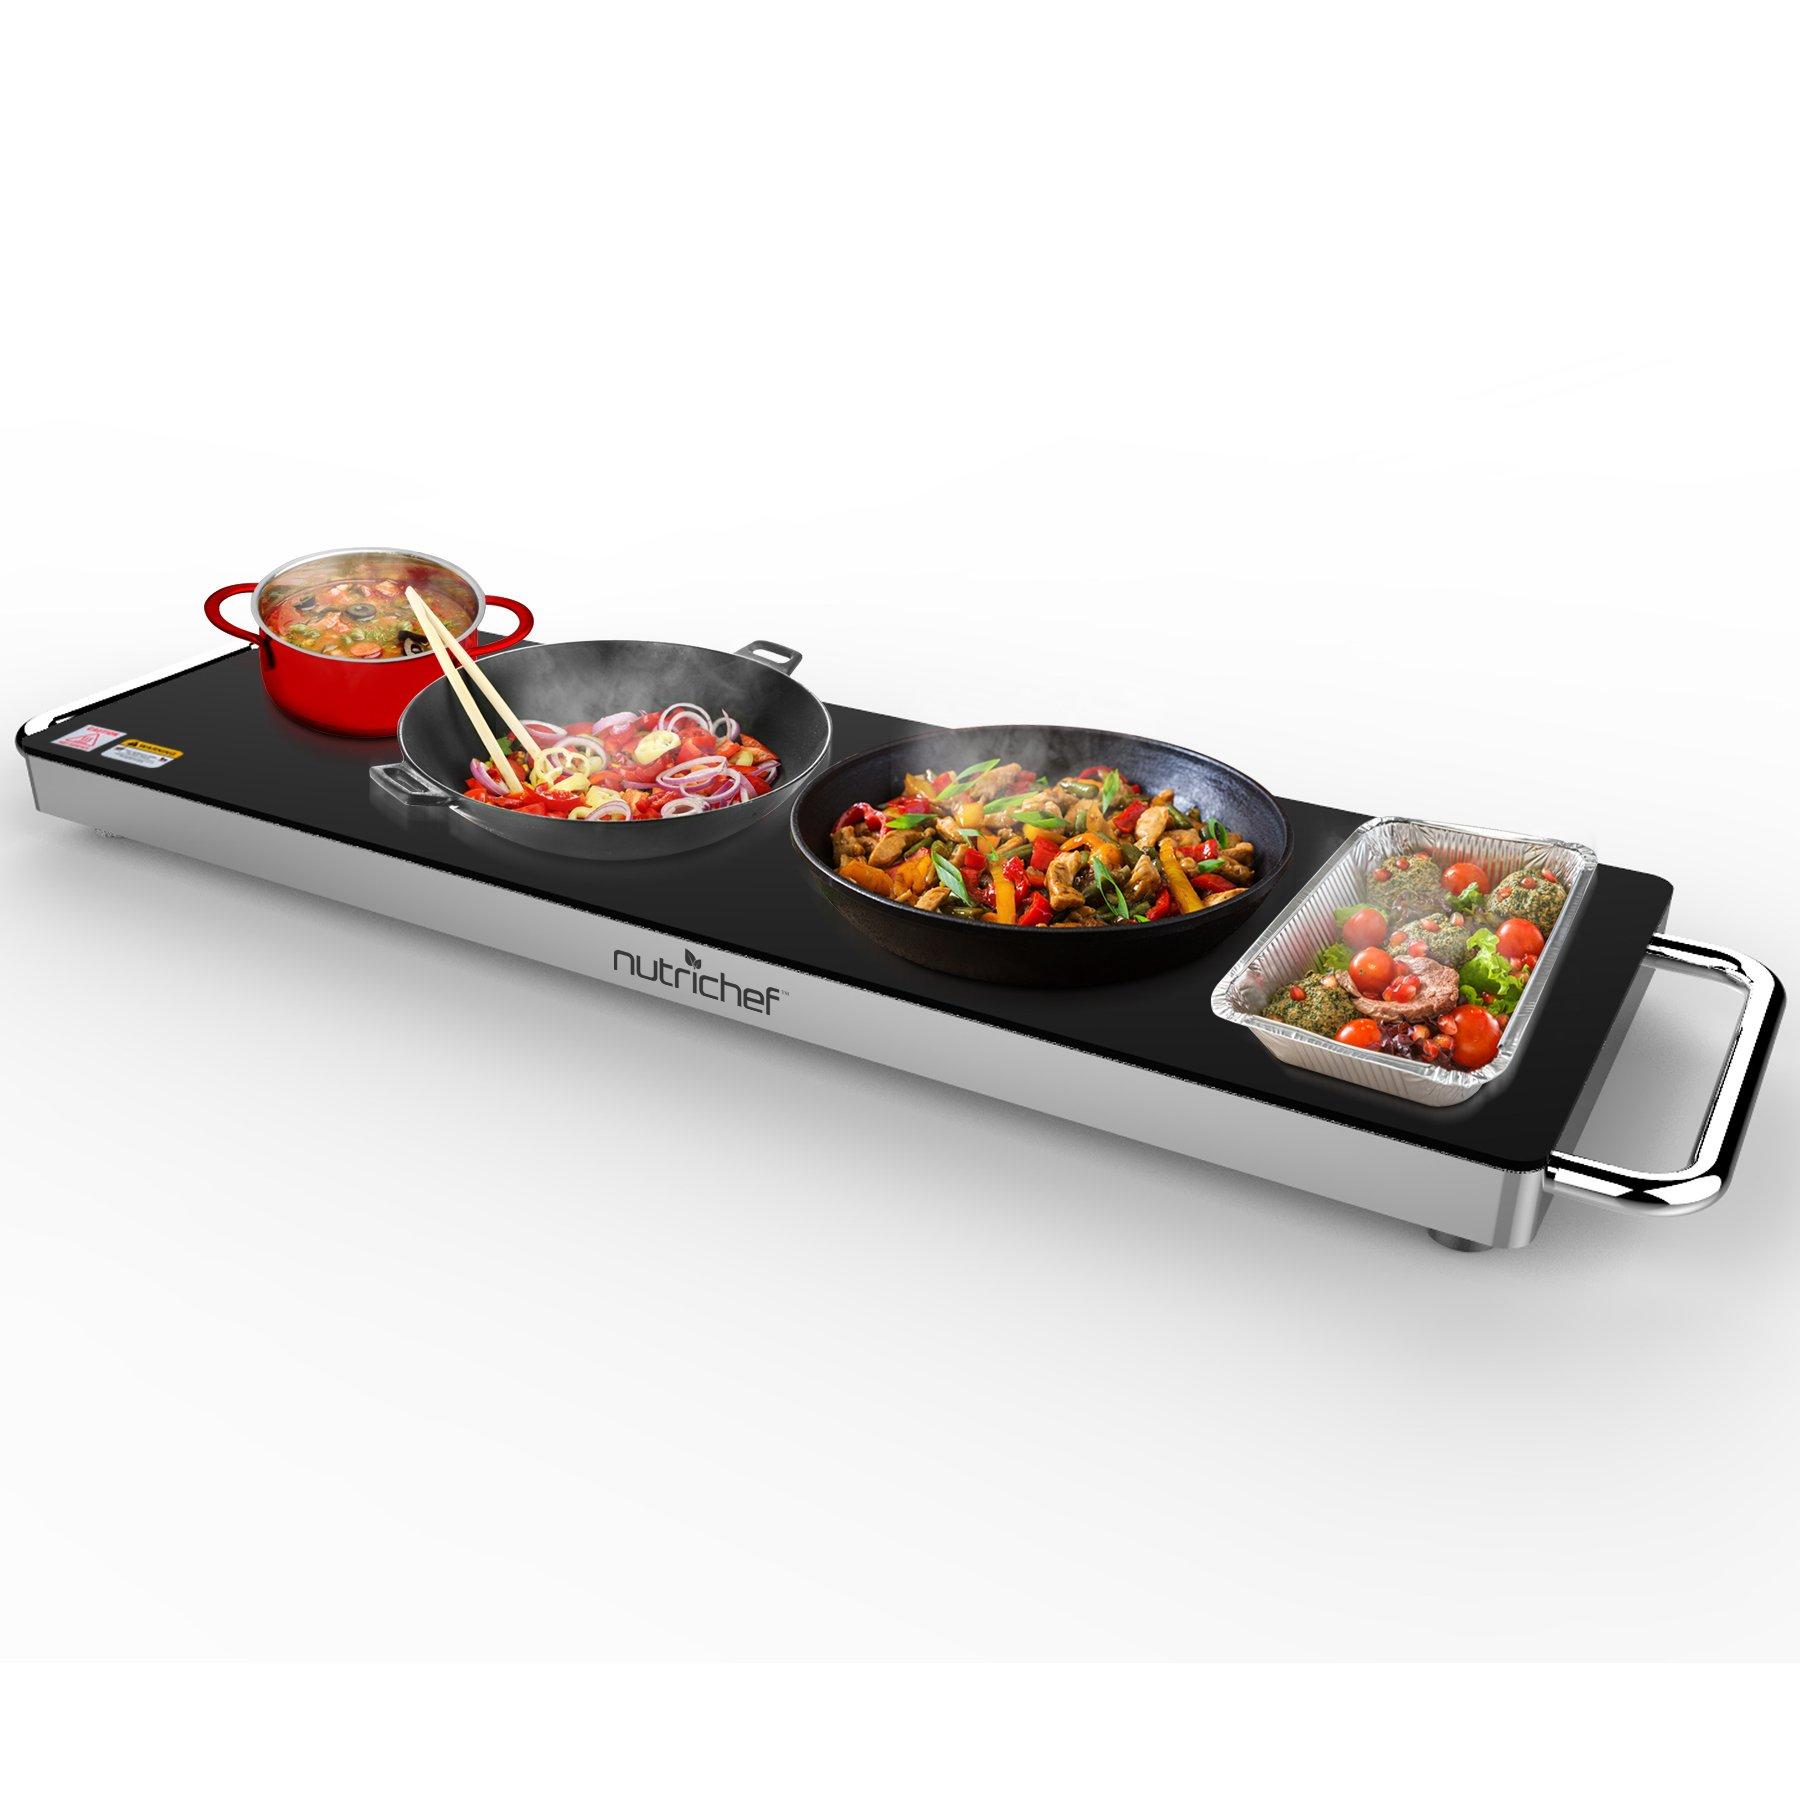 Nutrichef Electronic Warming Tray (PKWTR40)